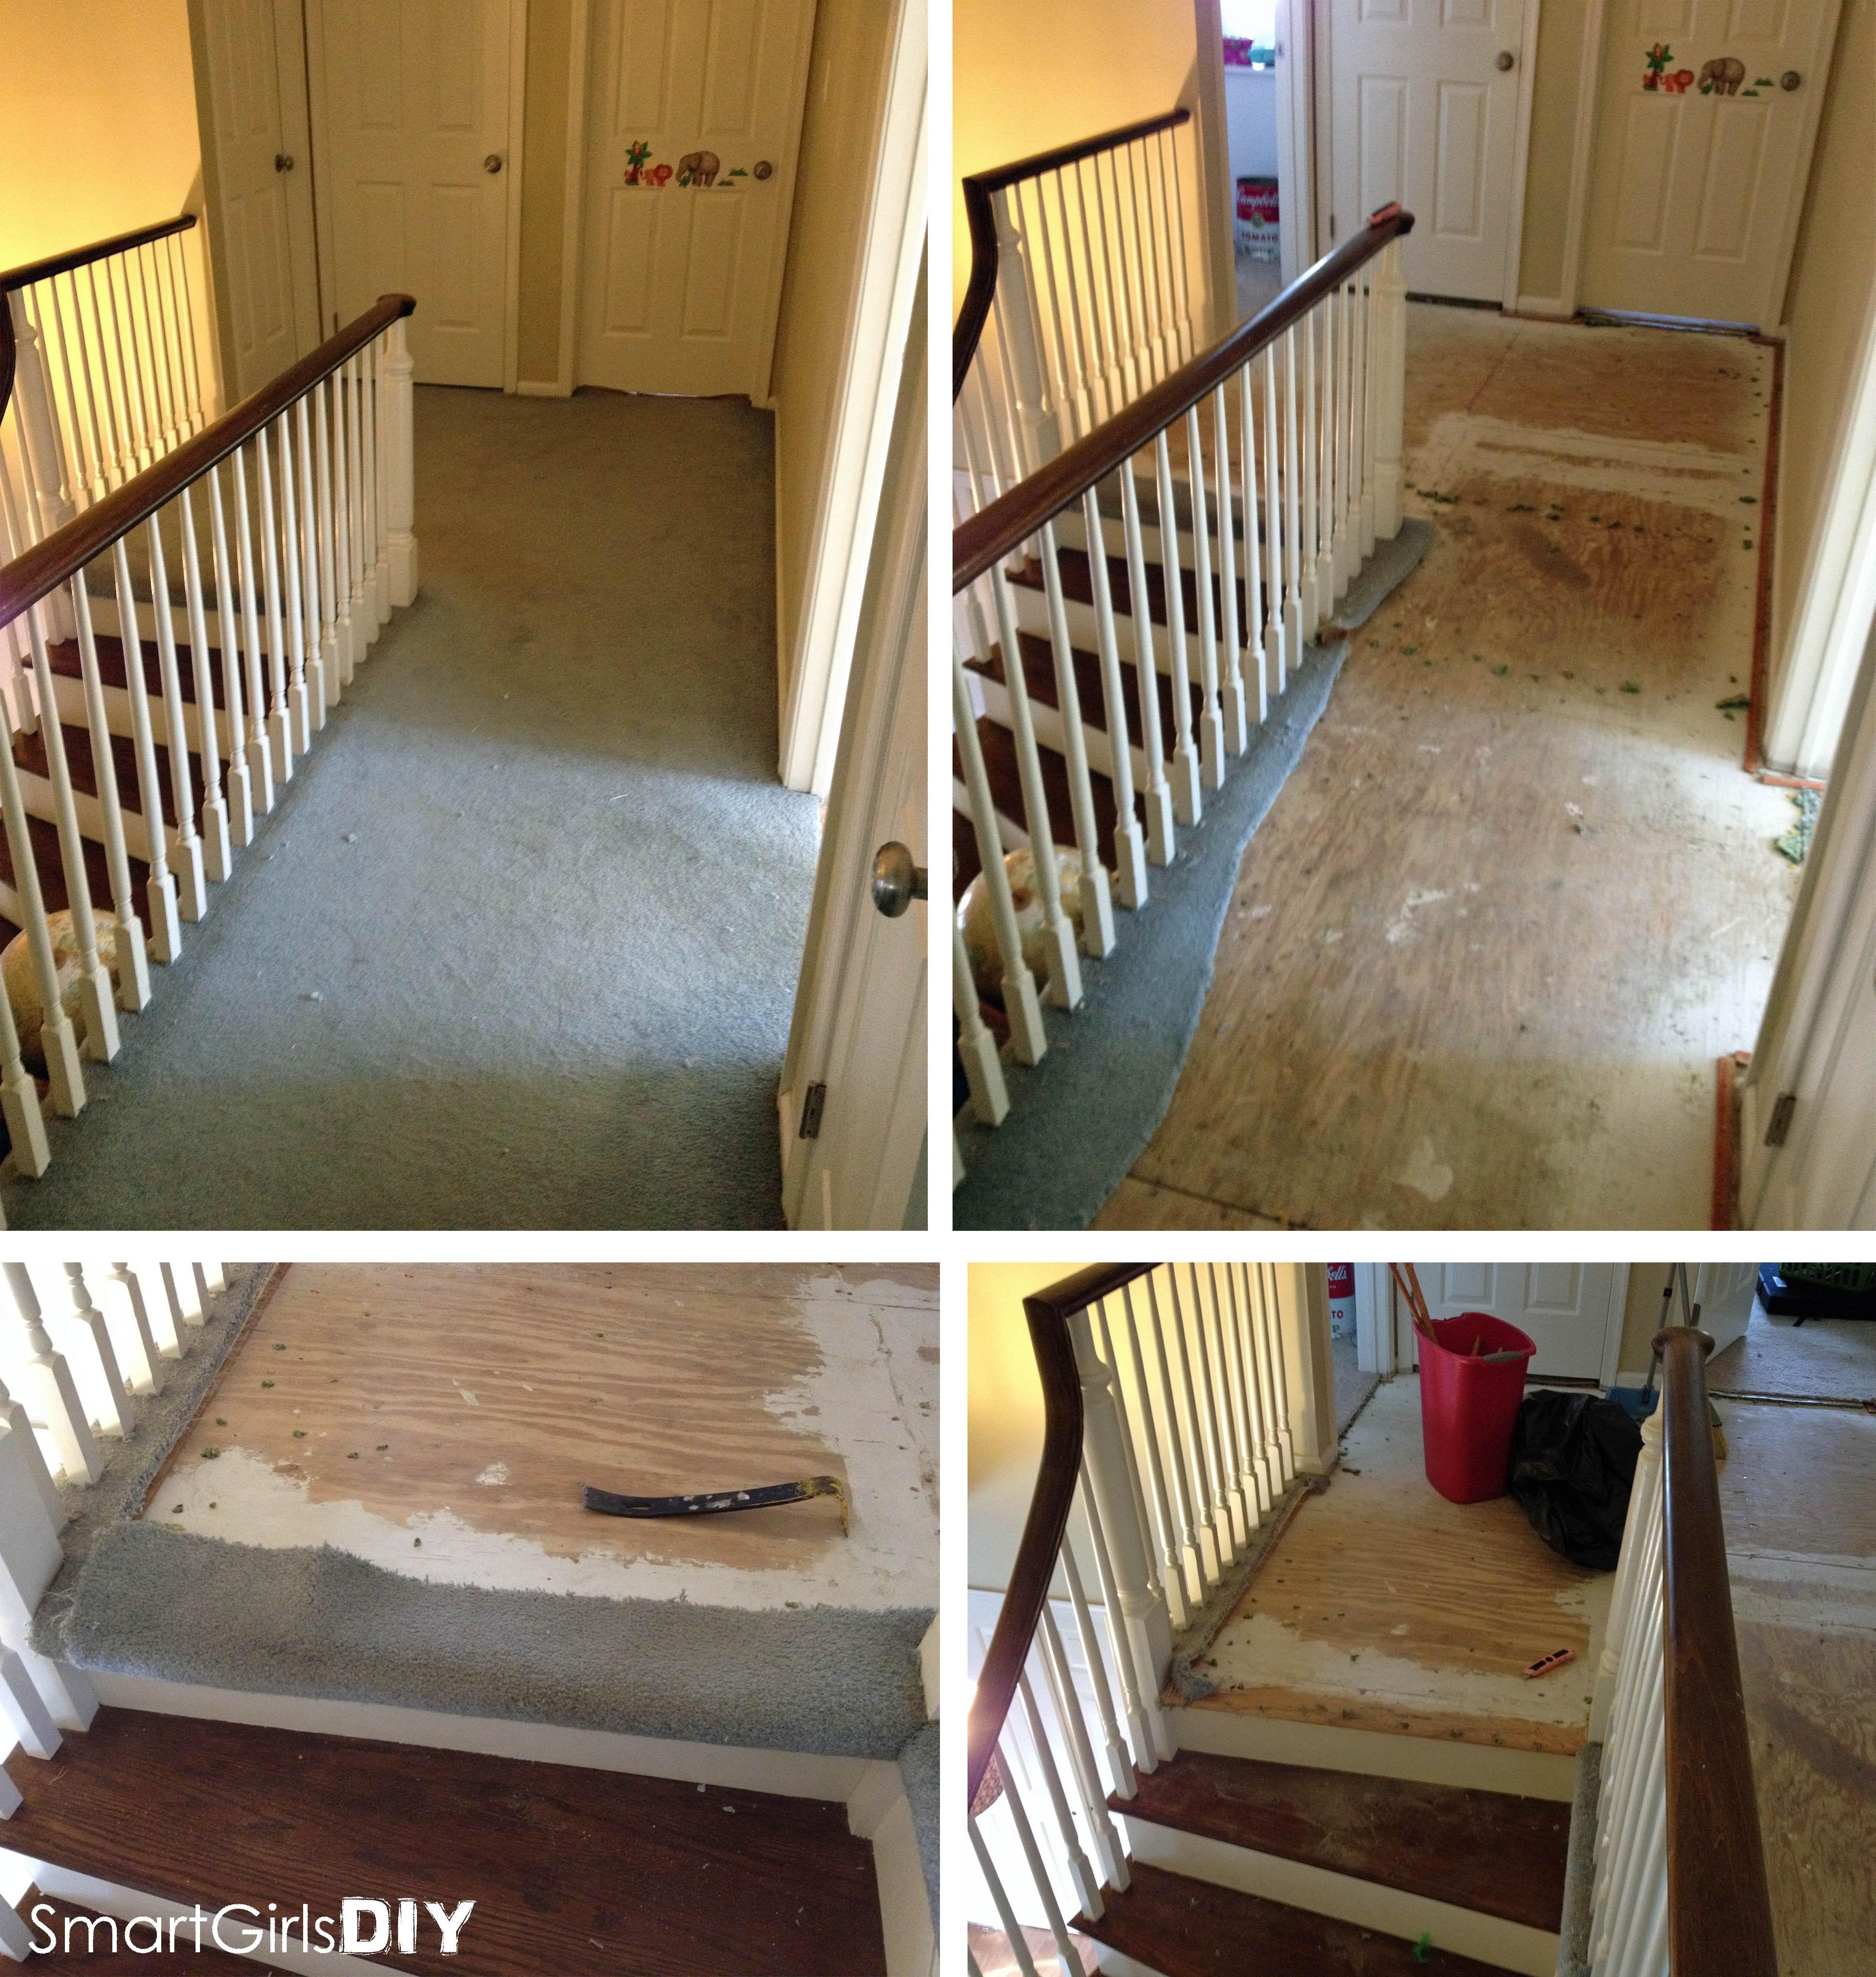 best vapor barrier for hardwood floors of upstairs hallway 1 installing hardwood floors intended for removing carpet from hallway installing the hardwood floor